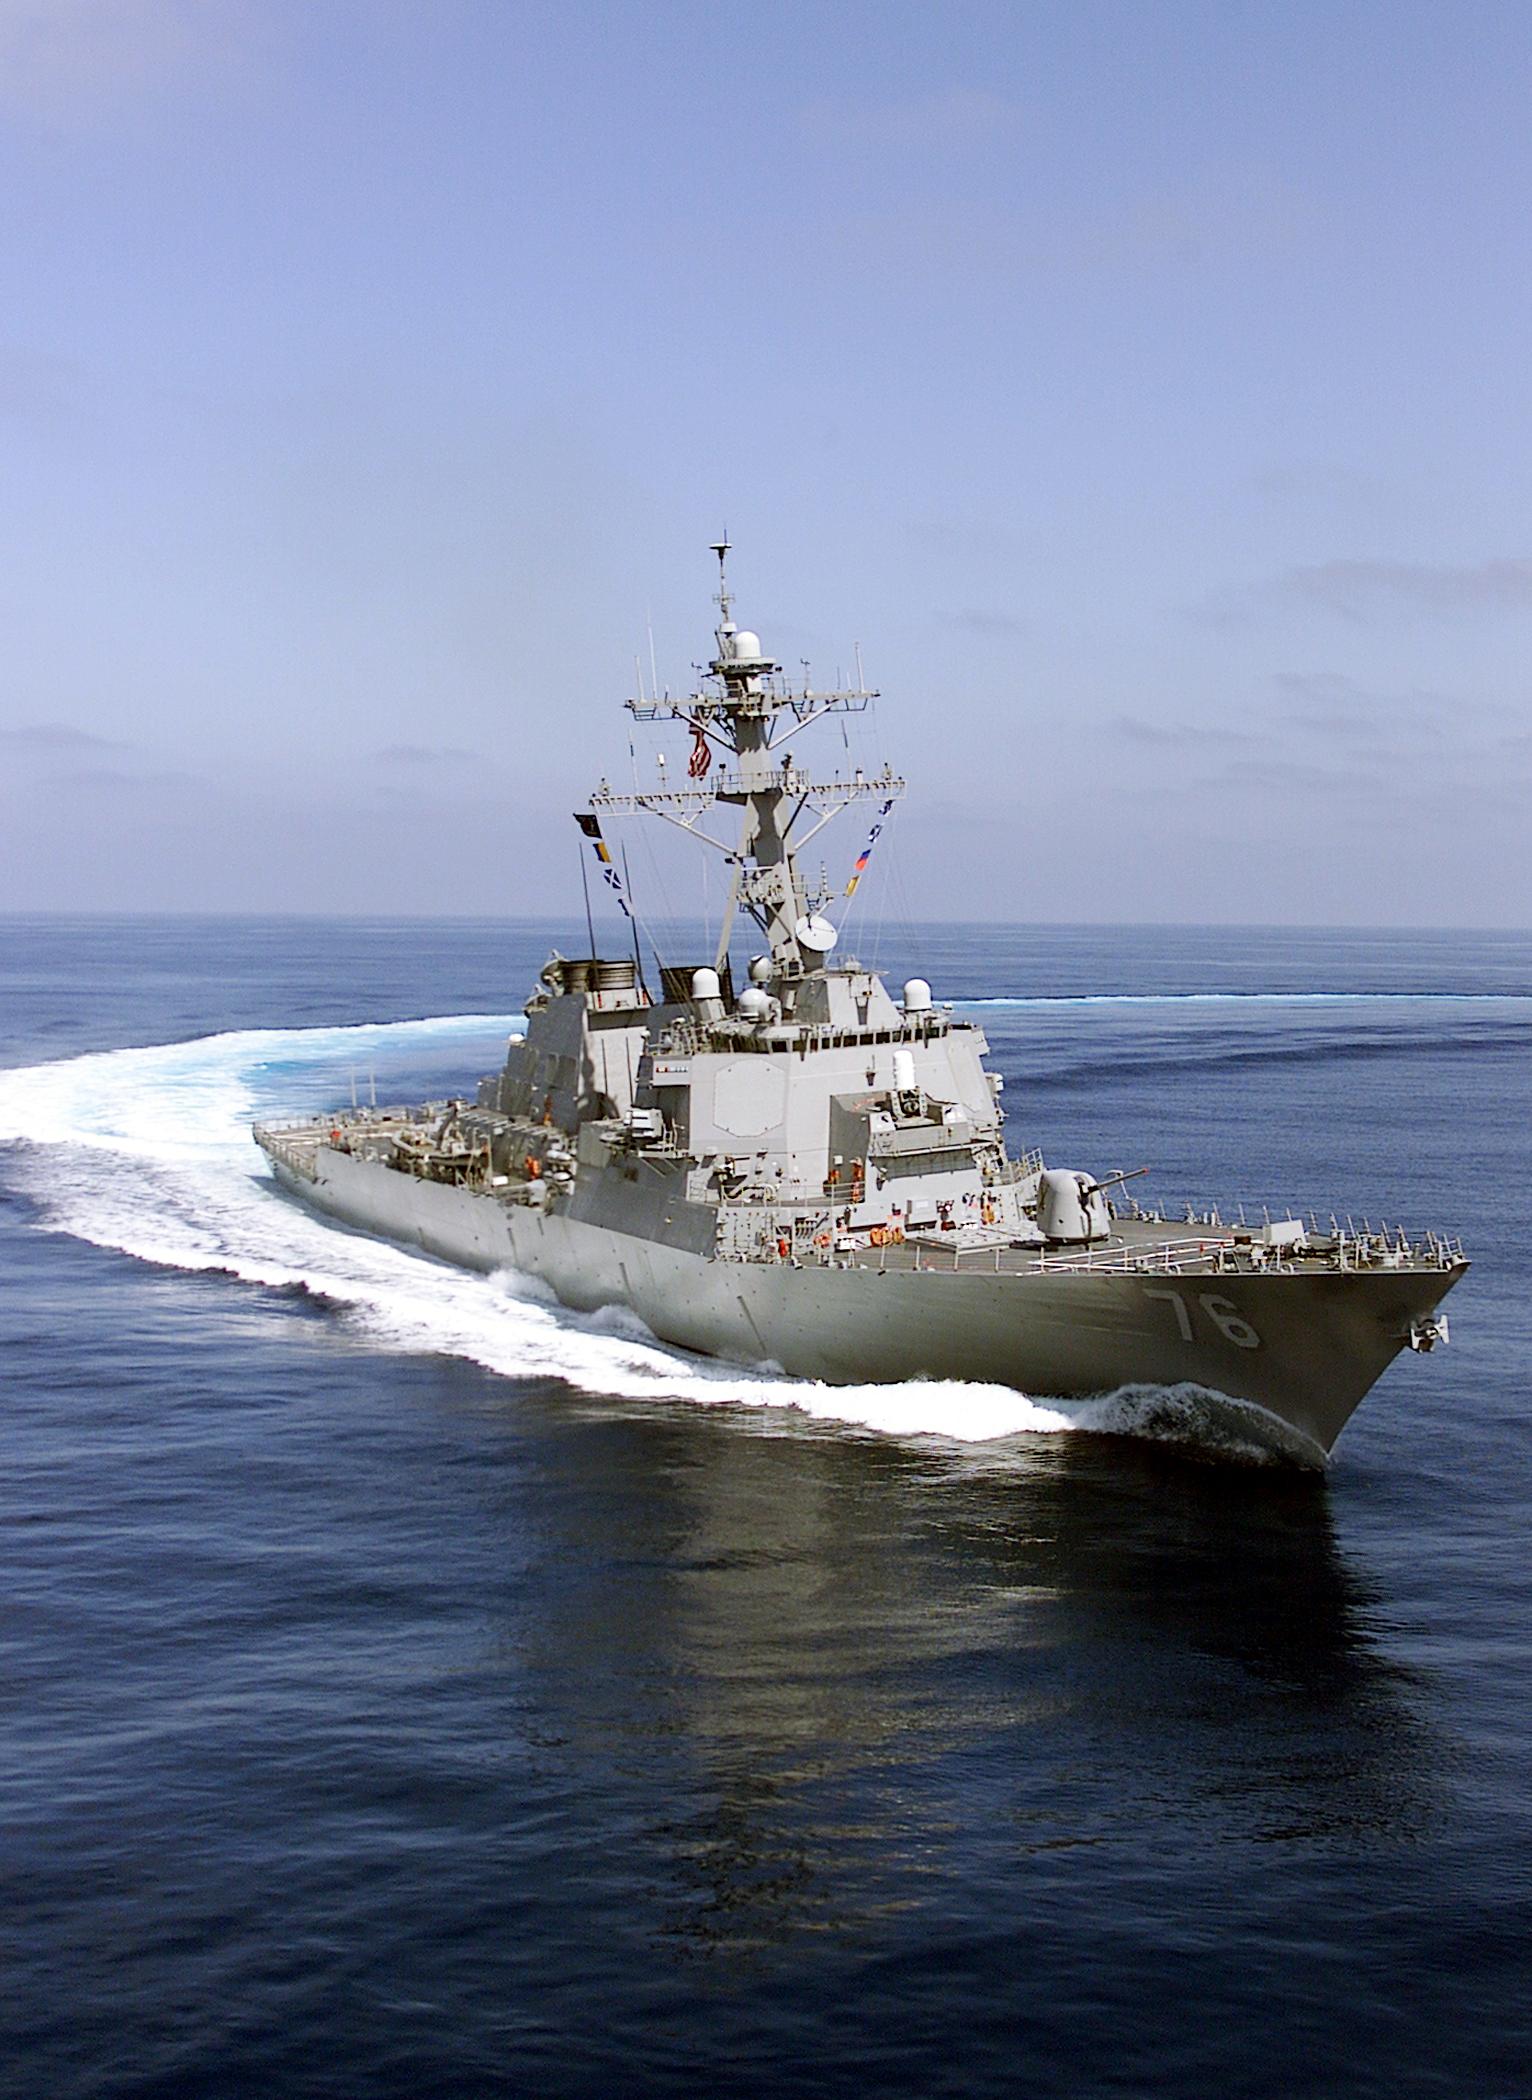 http://upload.wikimedia.org/wikipedia/commons/b/bc/USS_Higgins.jpg